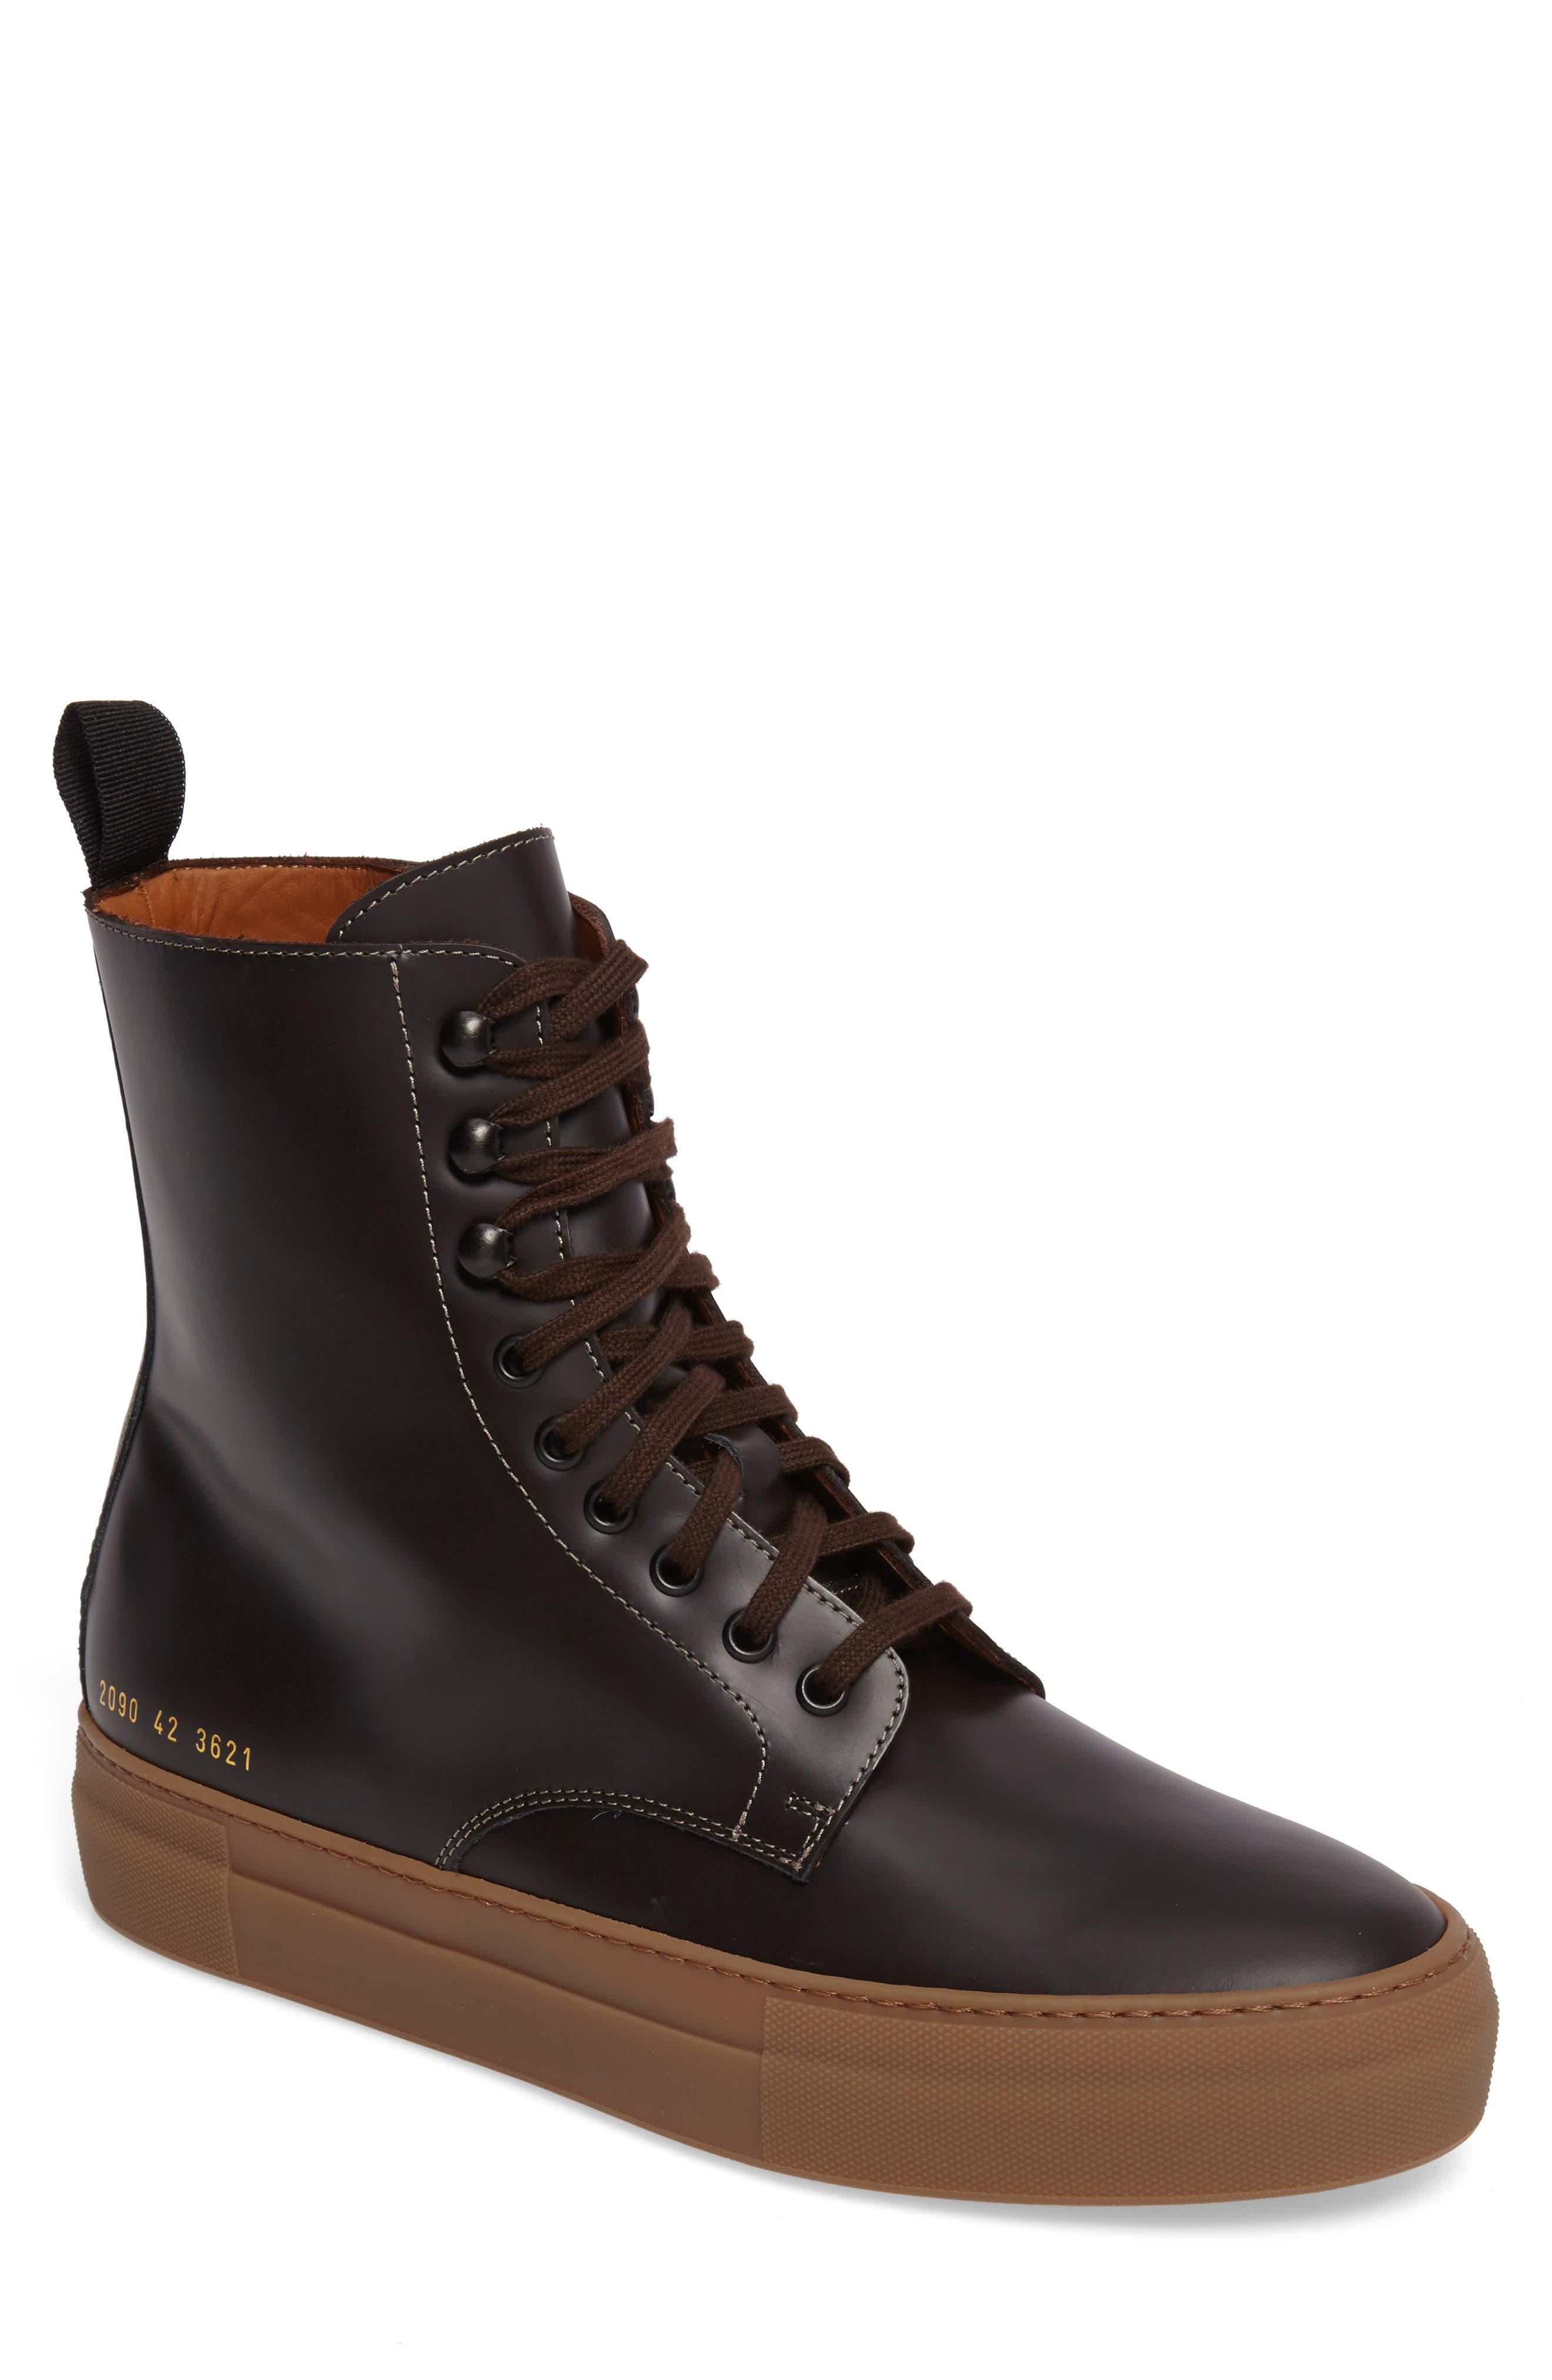 Main Image - Common Projects x Robert Geller Plain Toe Boot (Men)